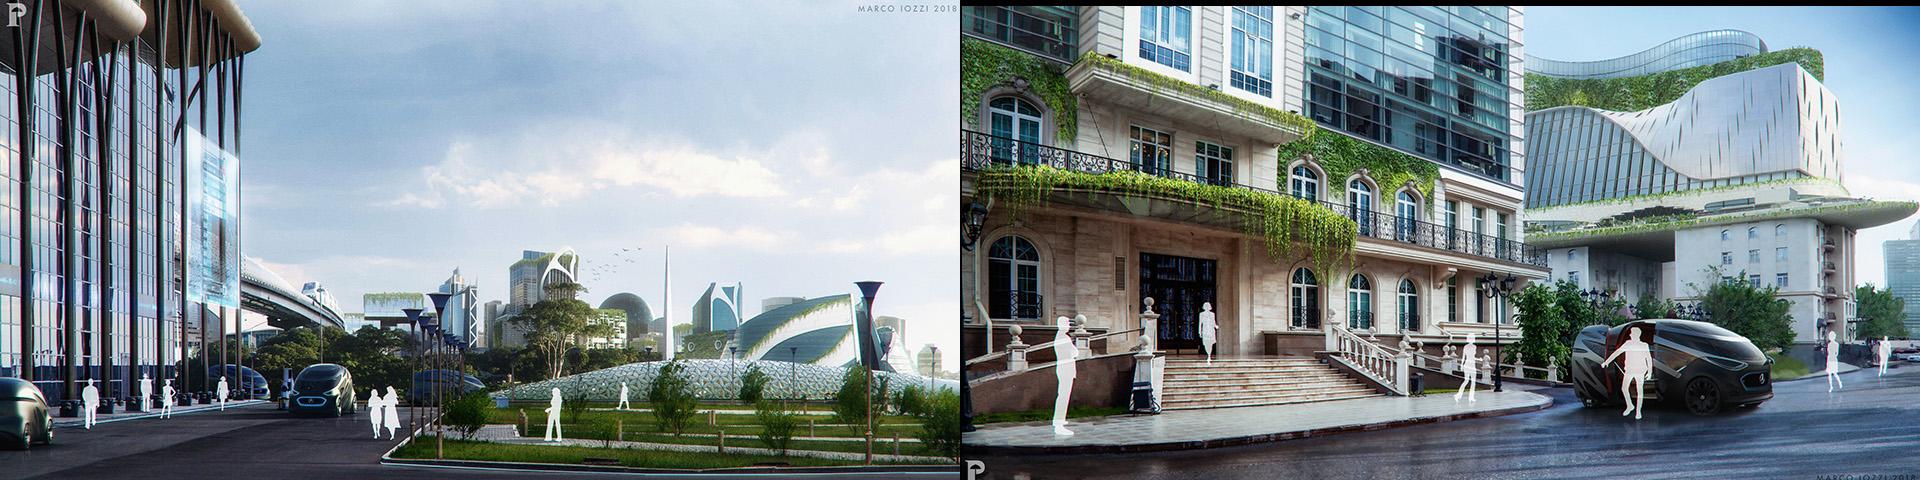 MERCEDES - Concept for future green city - PARASOL